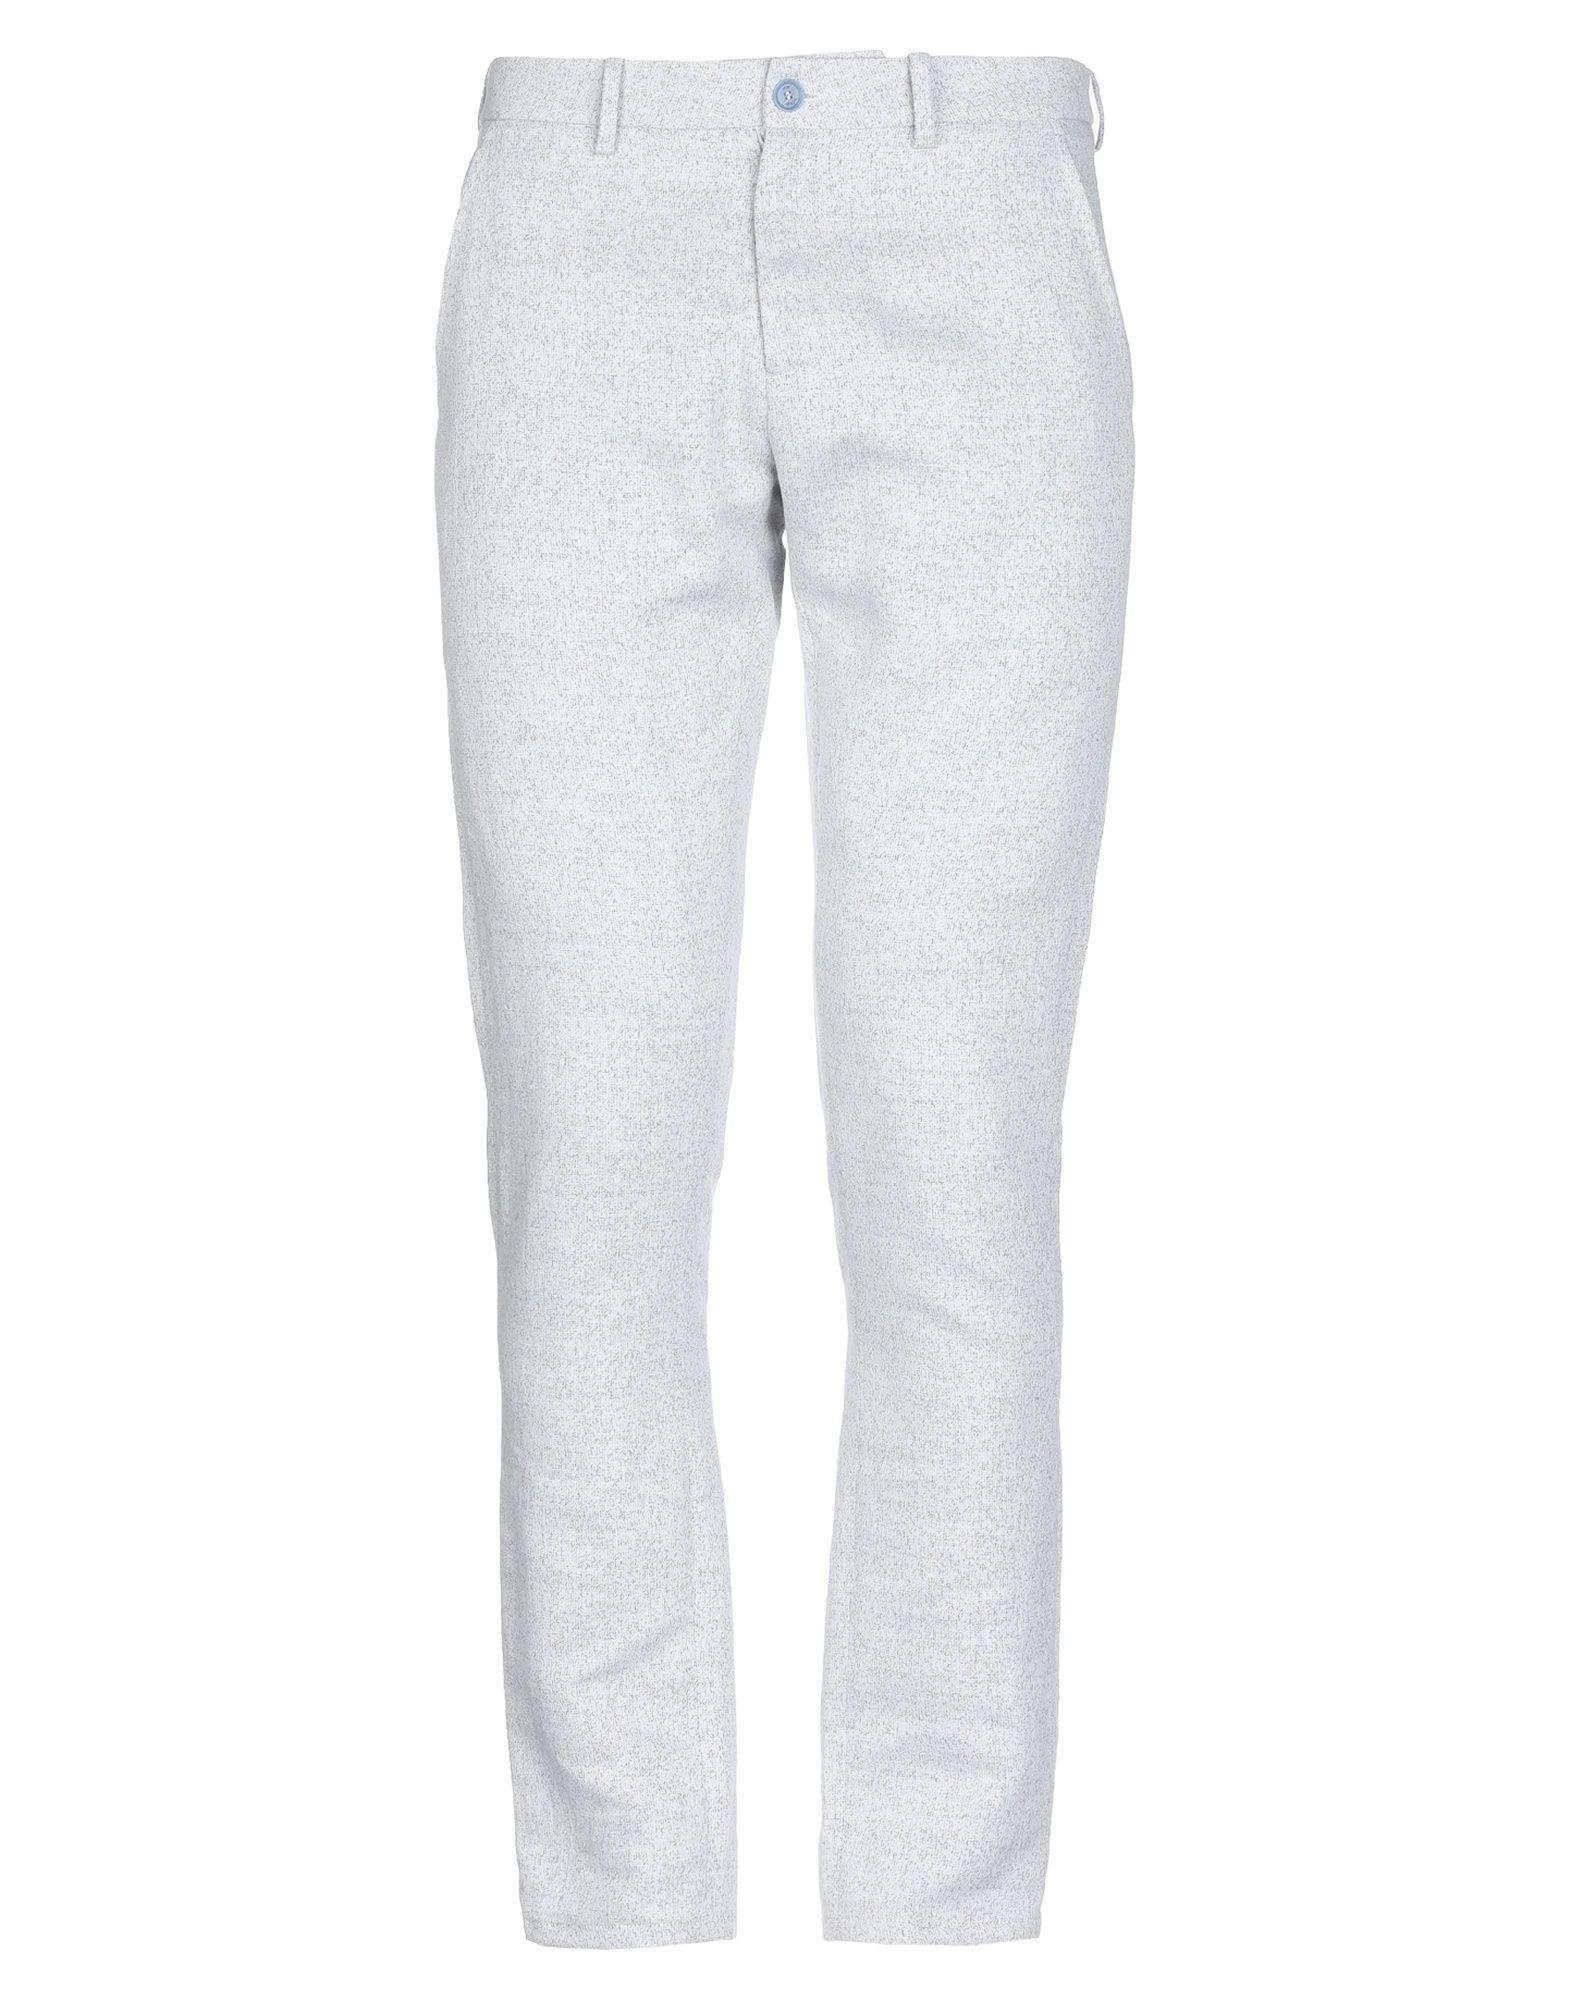 Pantalone Patrizia Pepe herren - 13312391OB